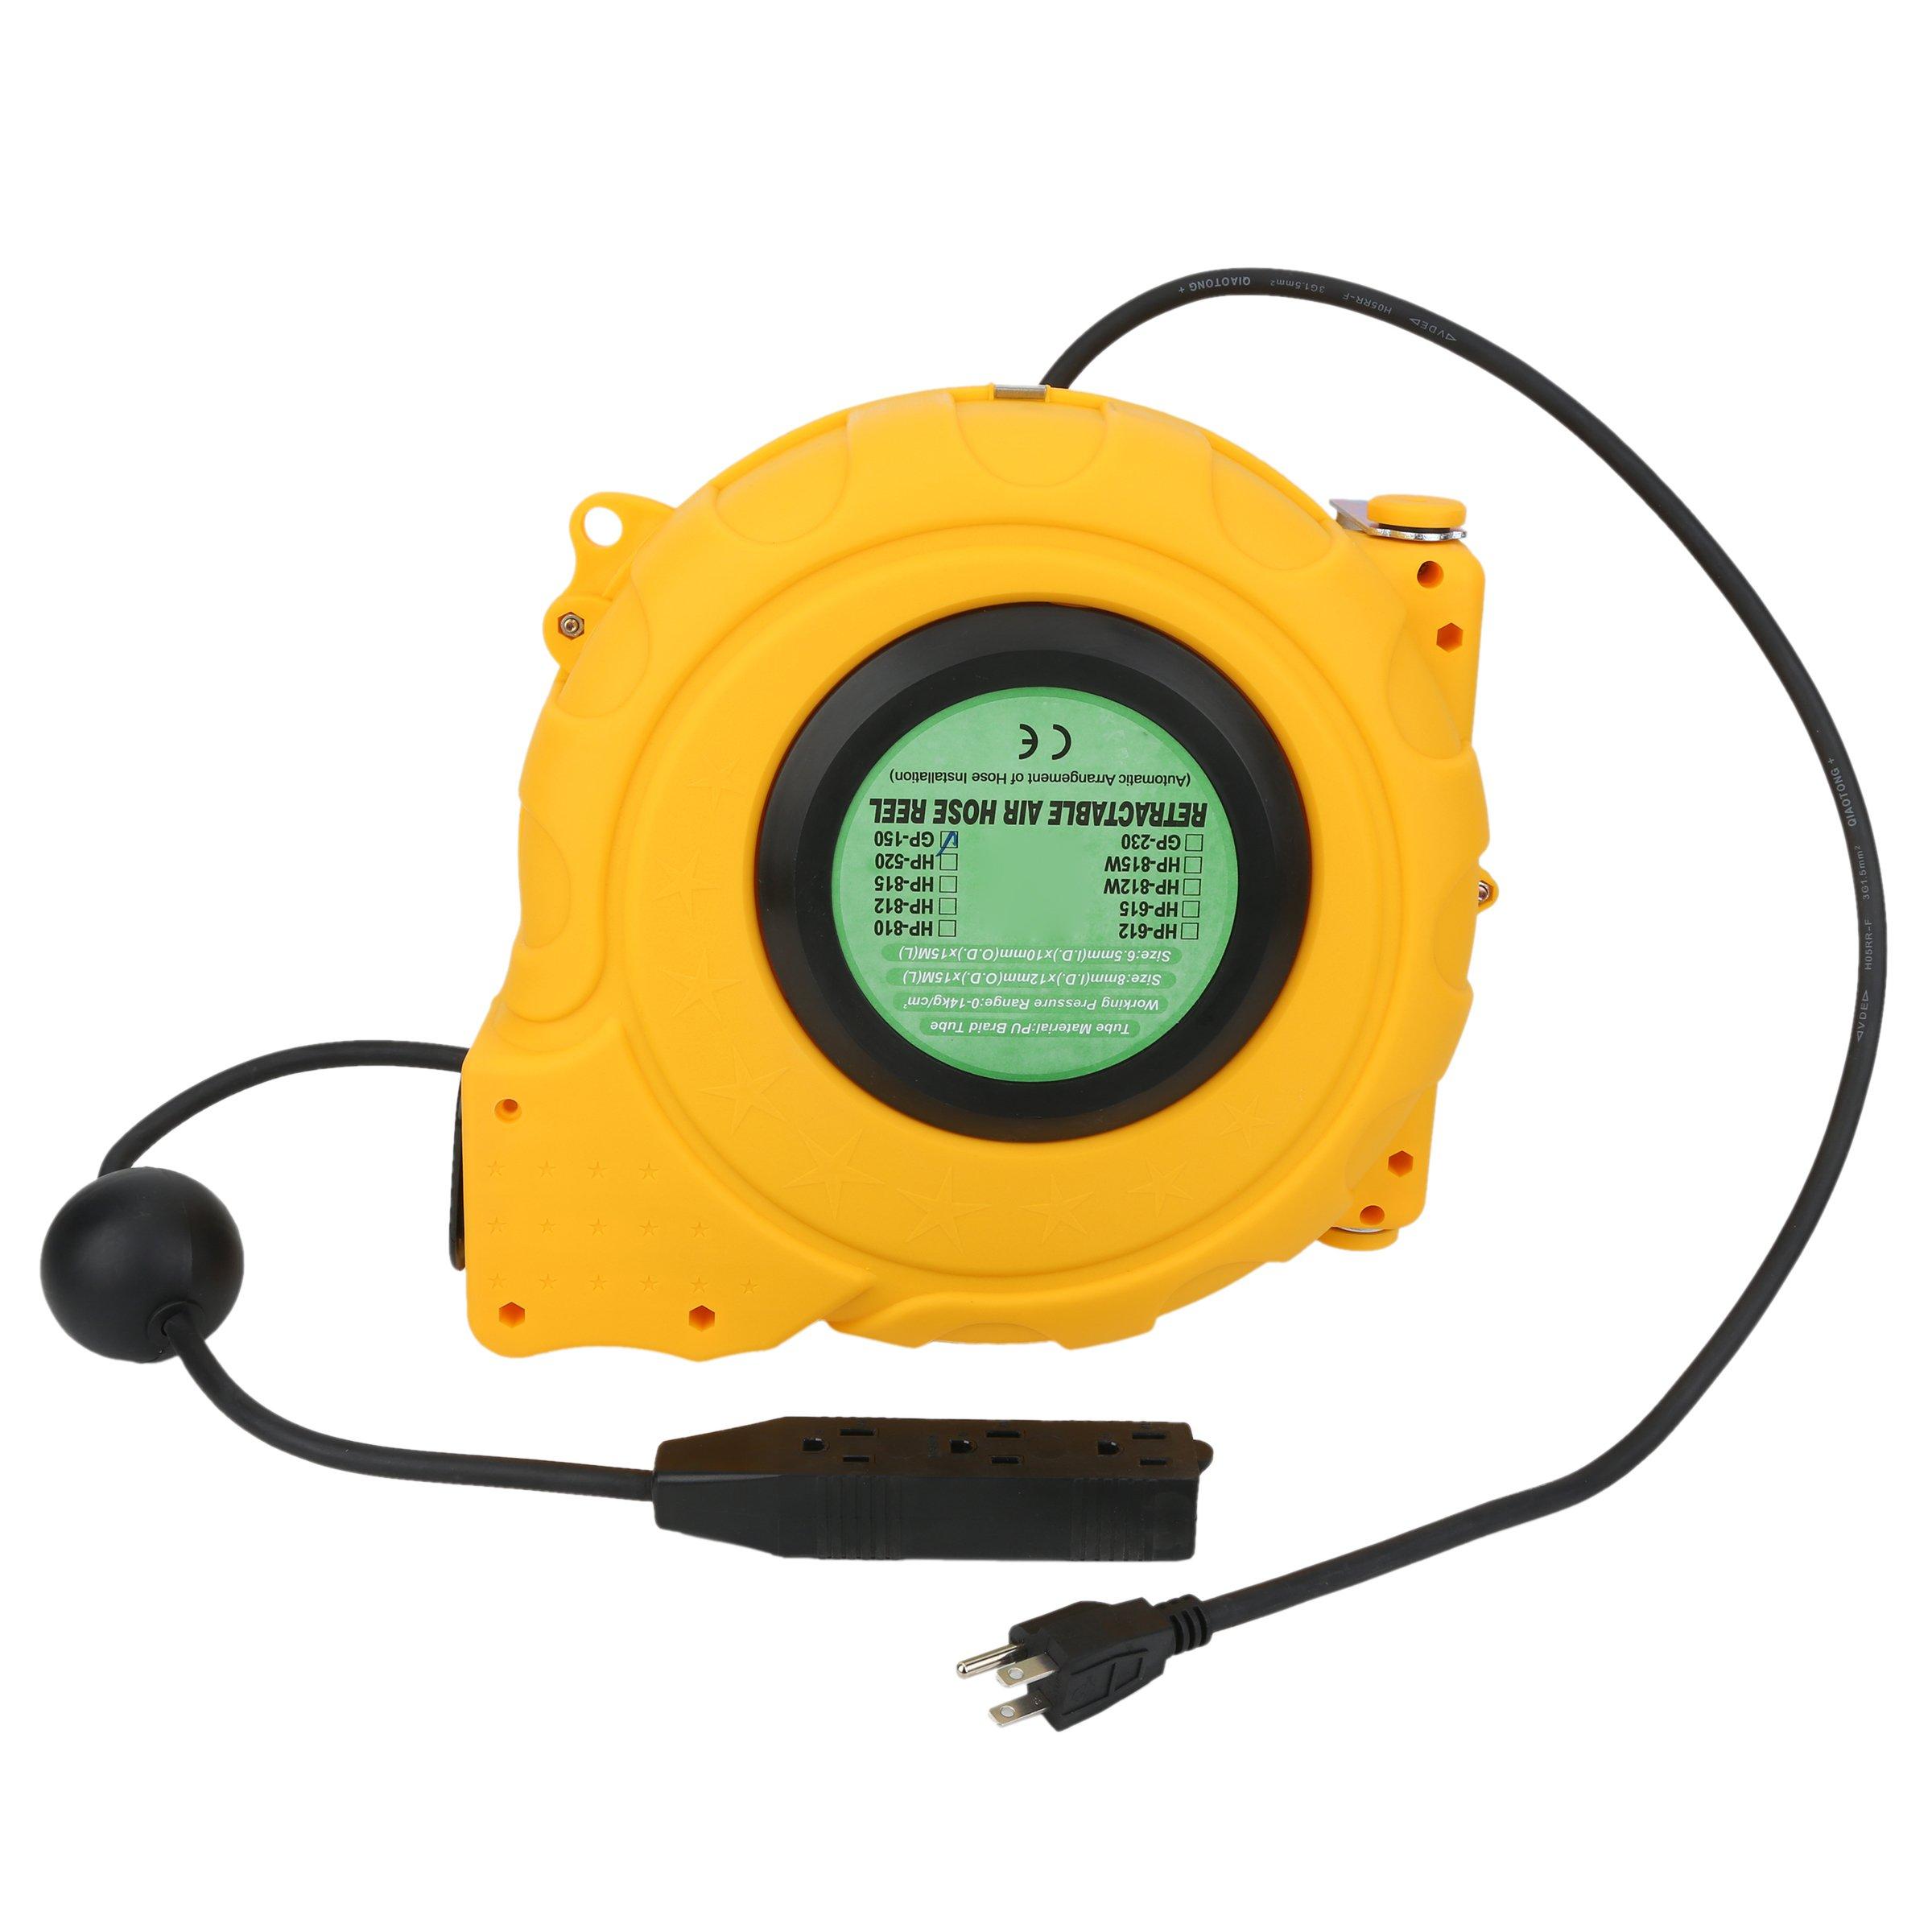 Valianto USA Standard Plug&Wire Design GP-150 50ft Electric Retractable Power Cord Reel